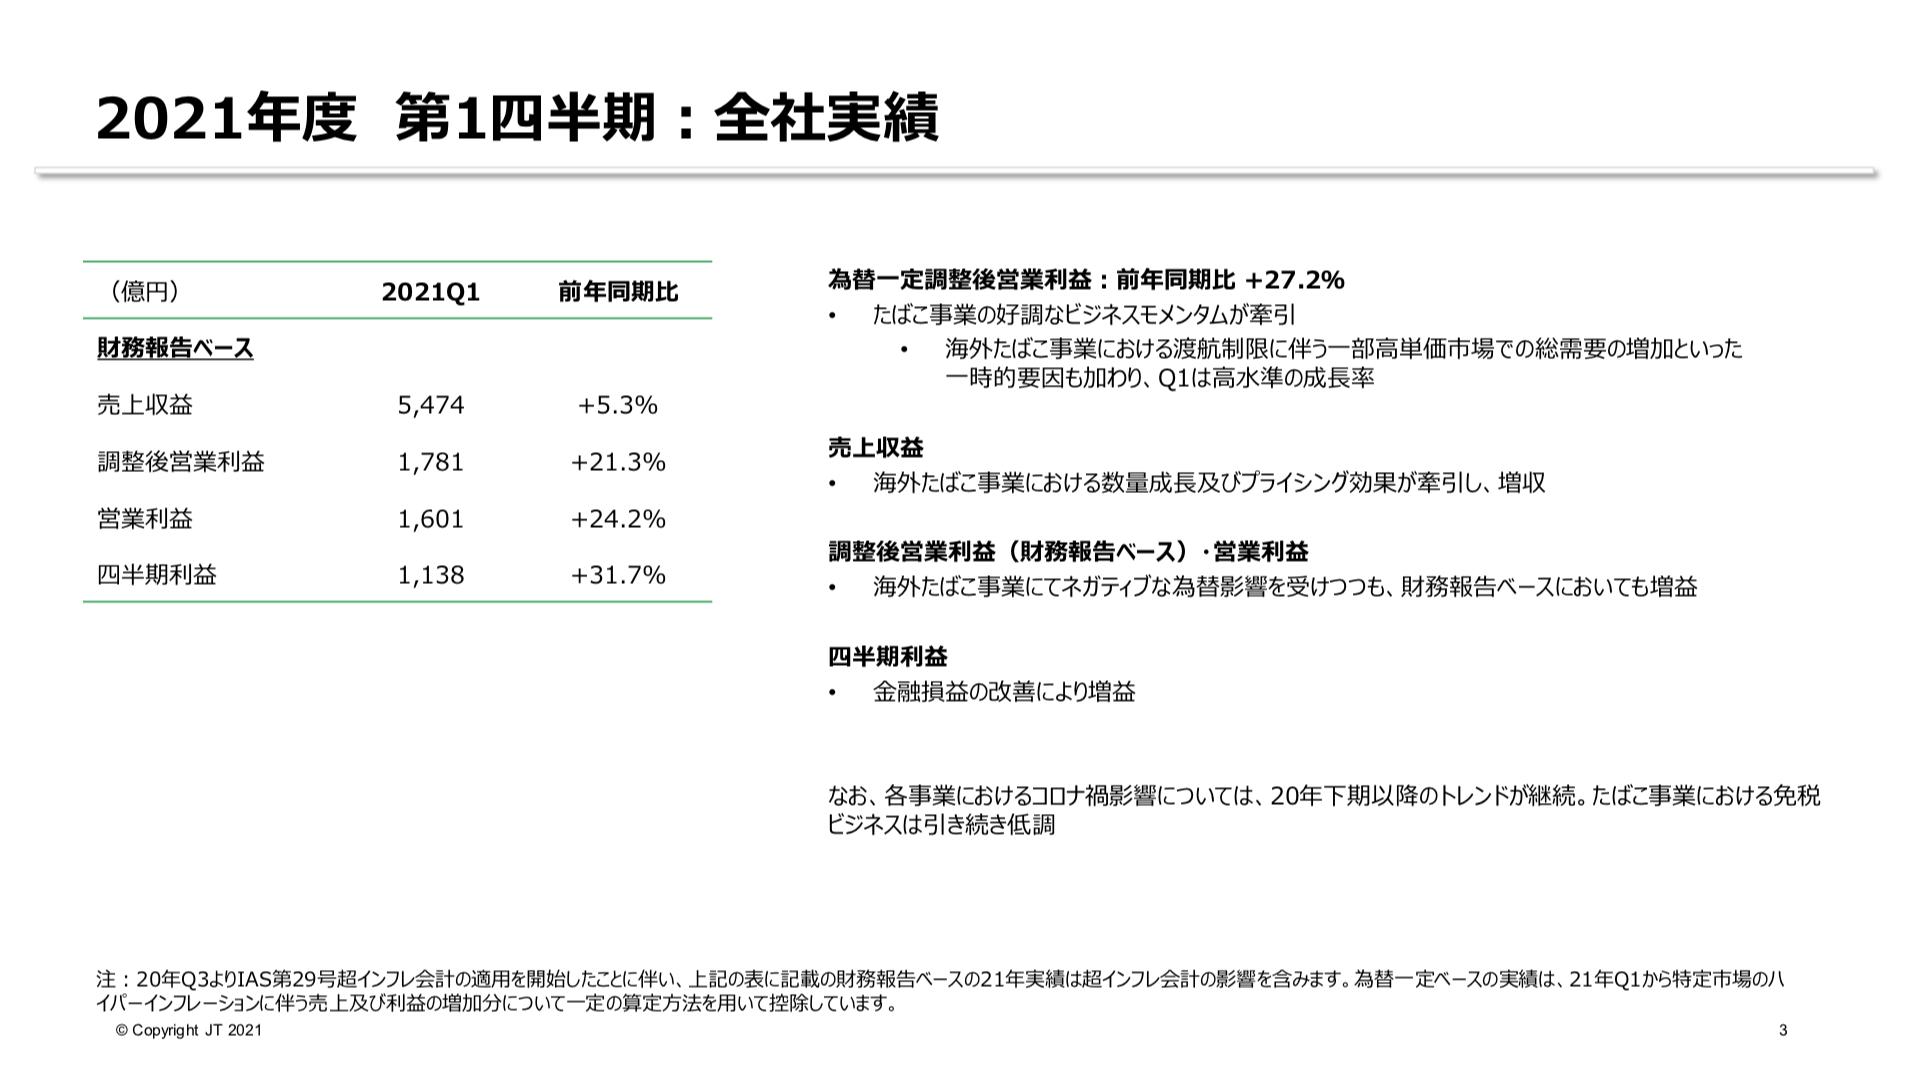 日本たばこ産業株式会社 2021年度 第1四半期 決算説明会資料